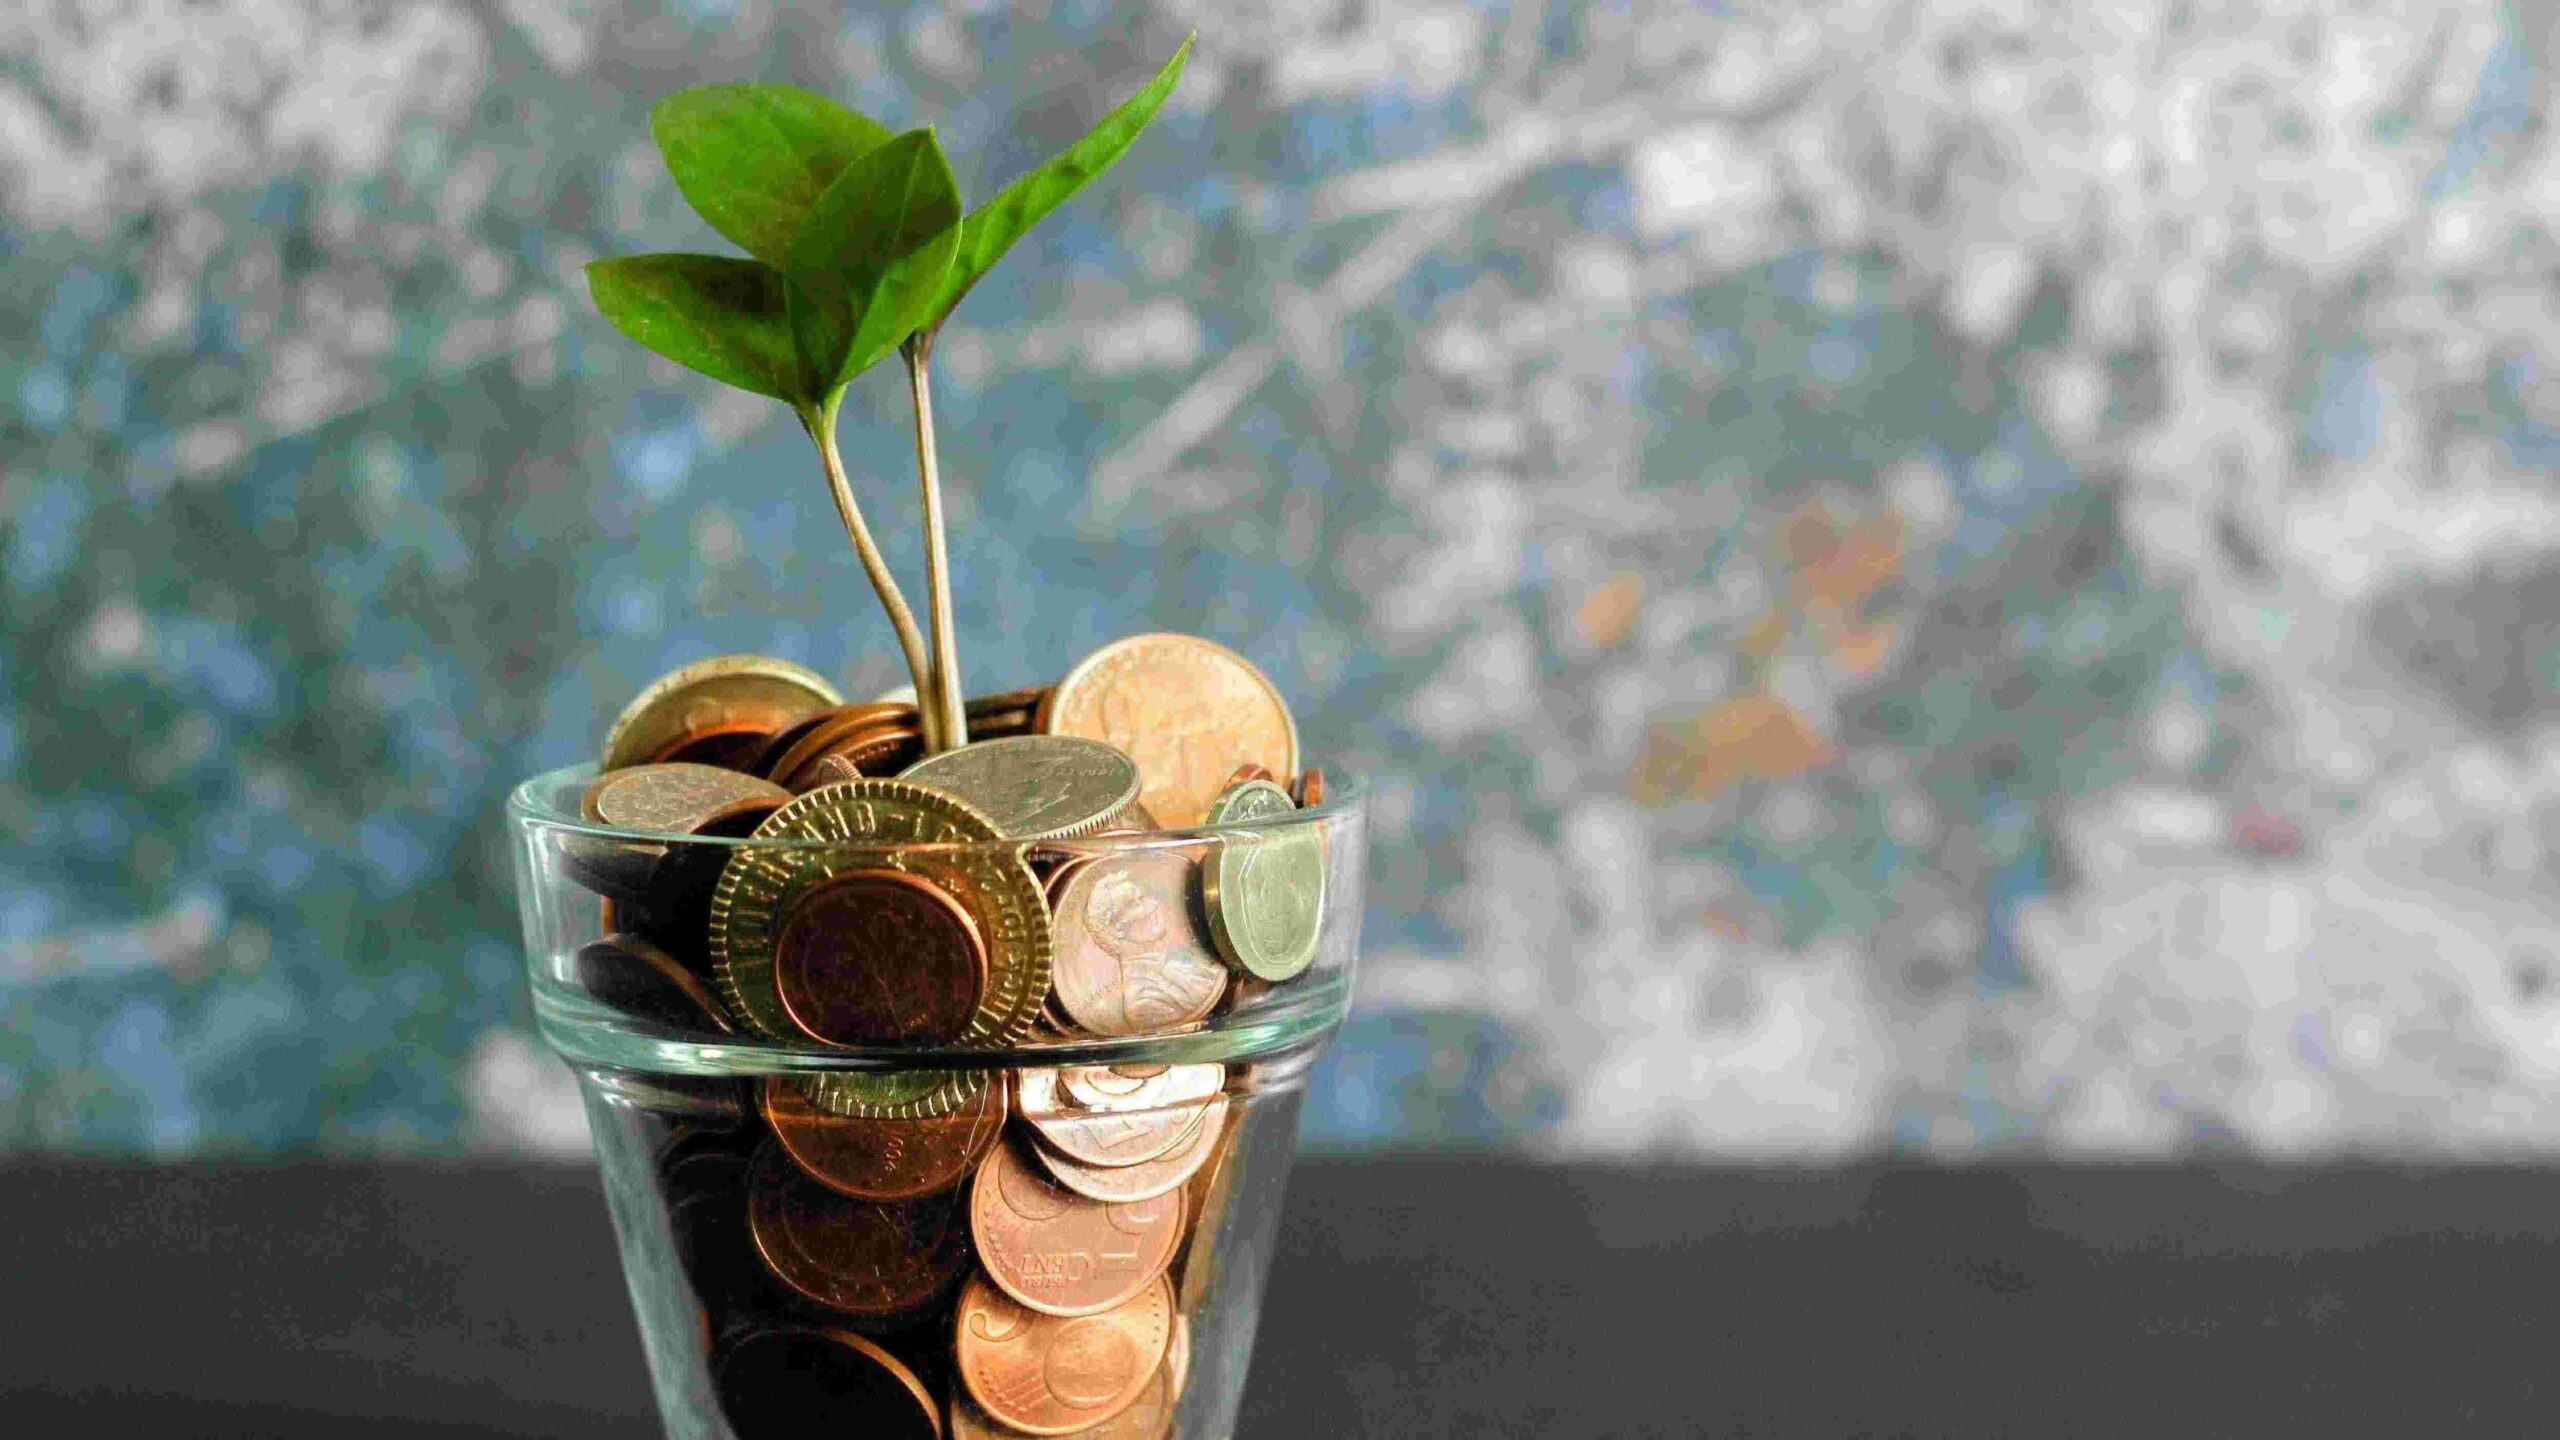 Financing & Using Umbrella Services